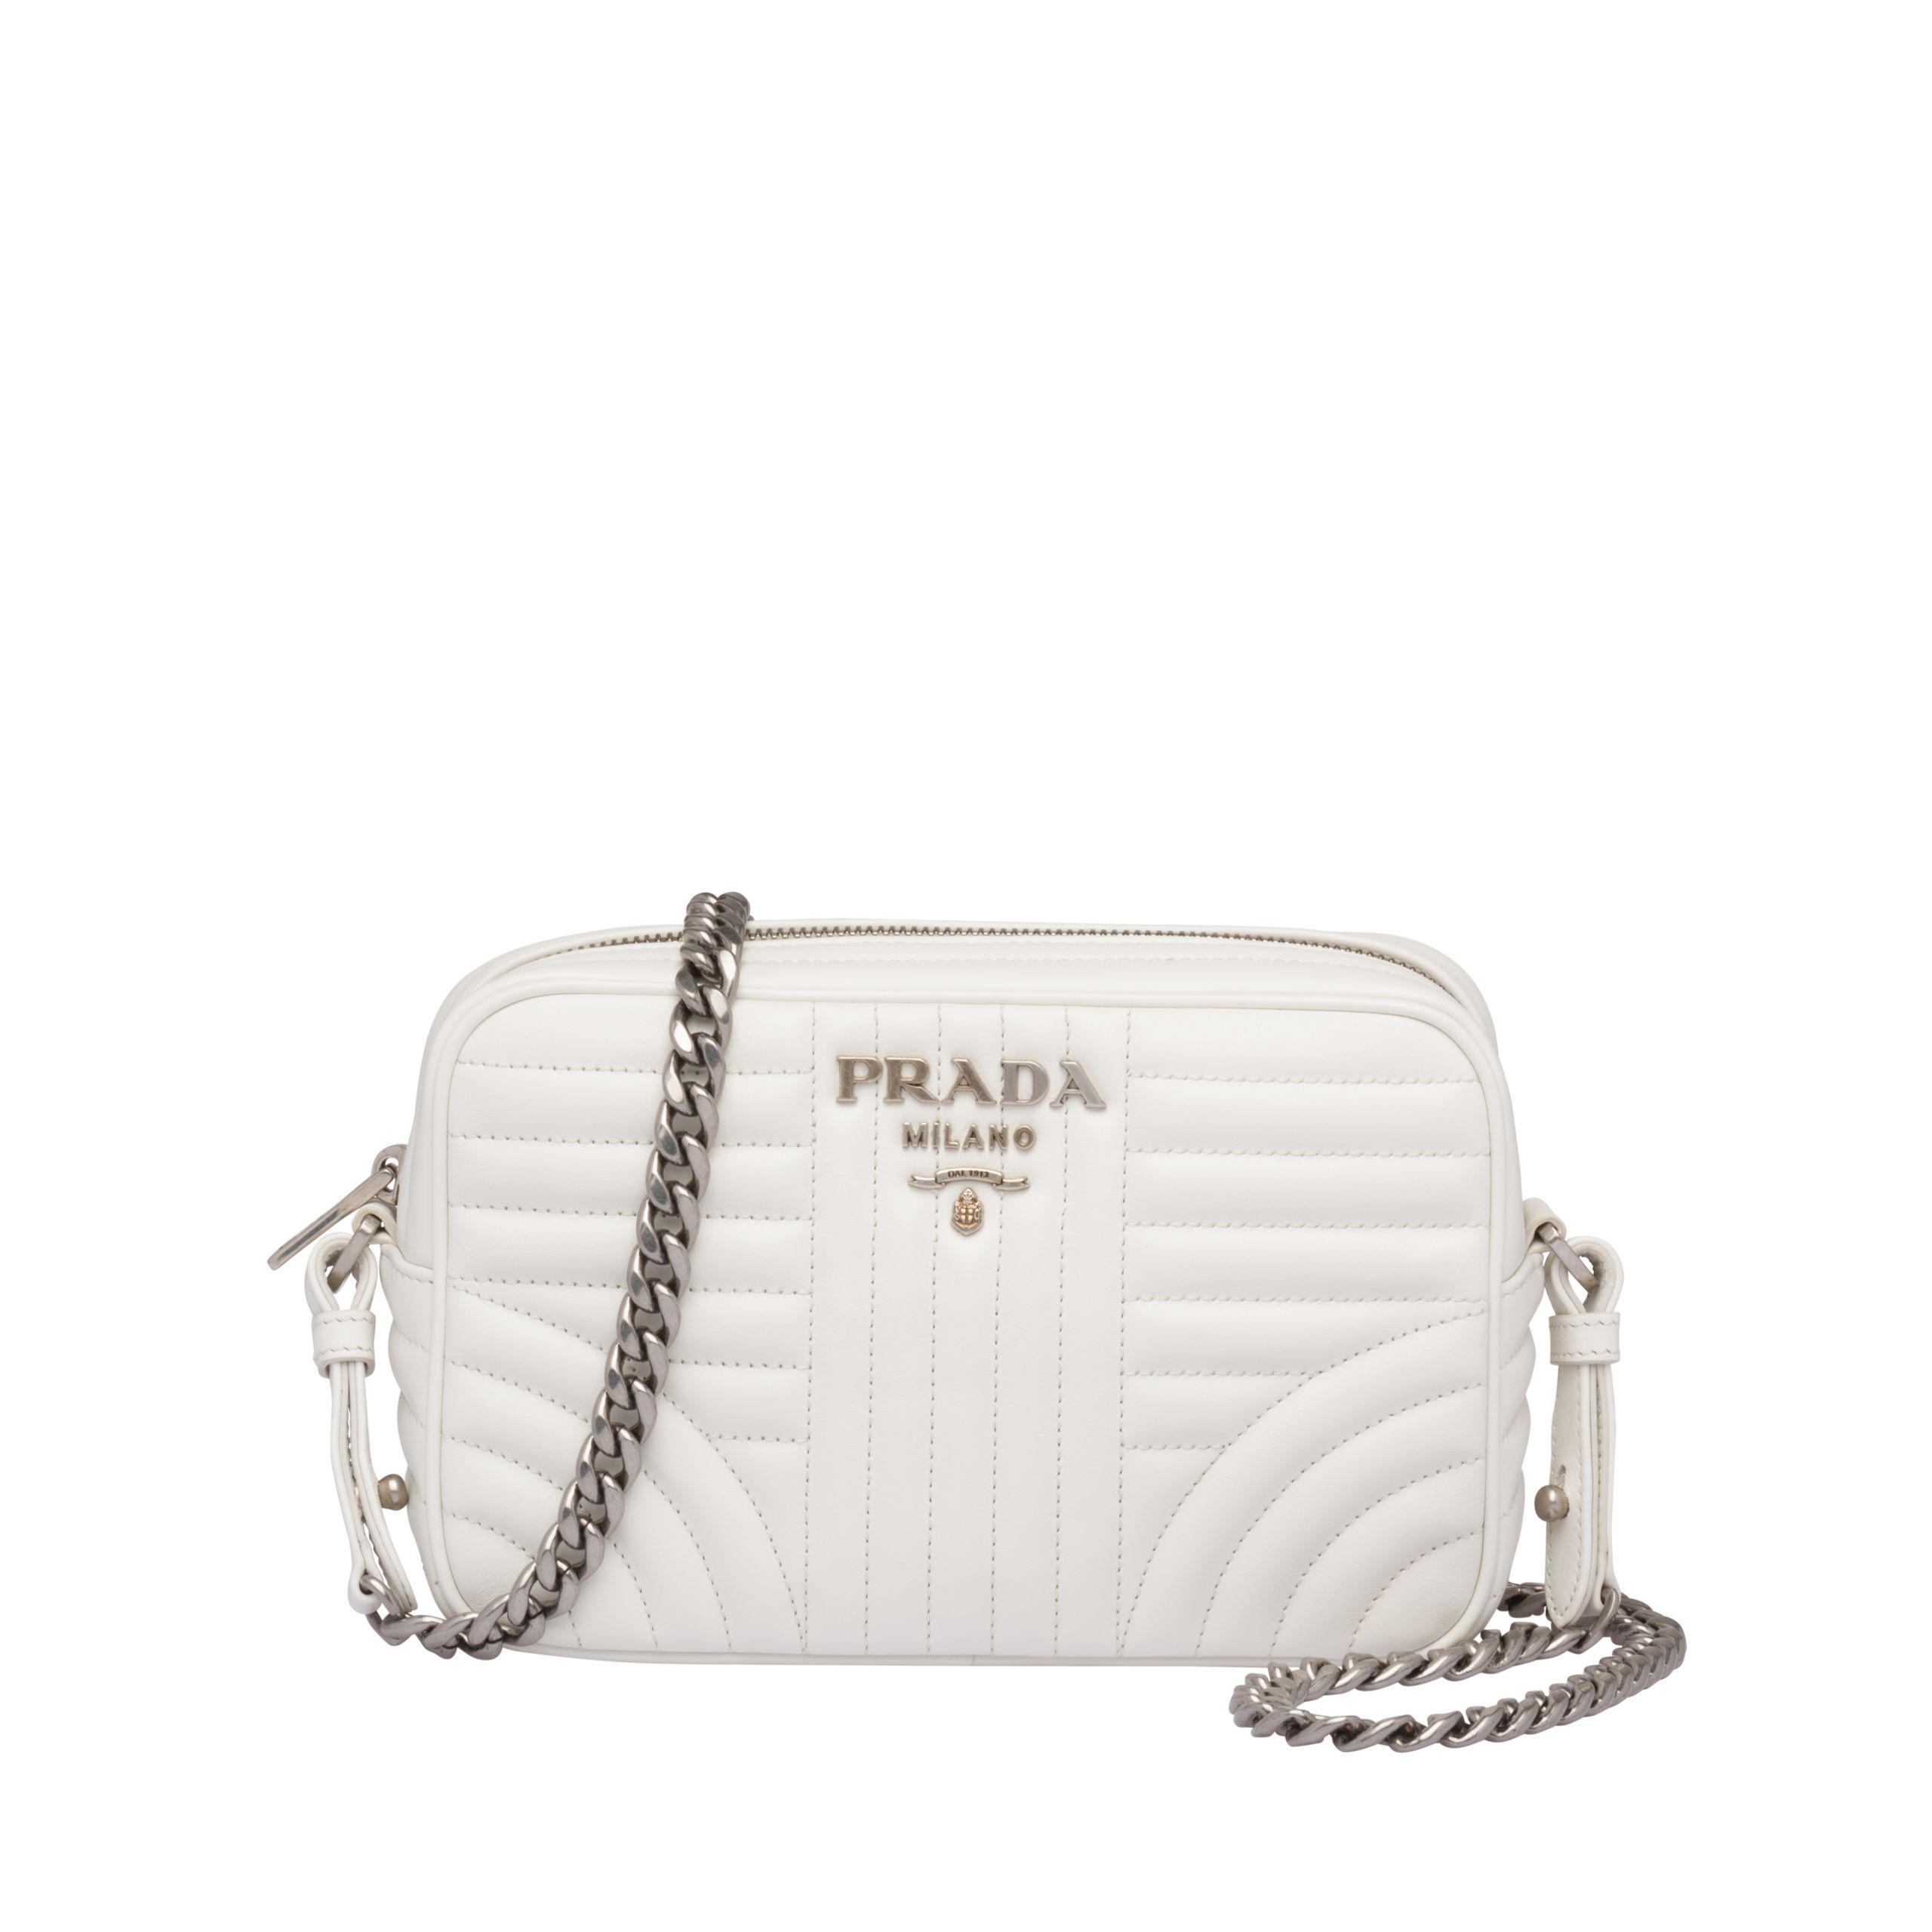 4bcc271127e6 Prada - Multicolor Diagramme Leather Cross-body Bag - Lyst. View fullscreen